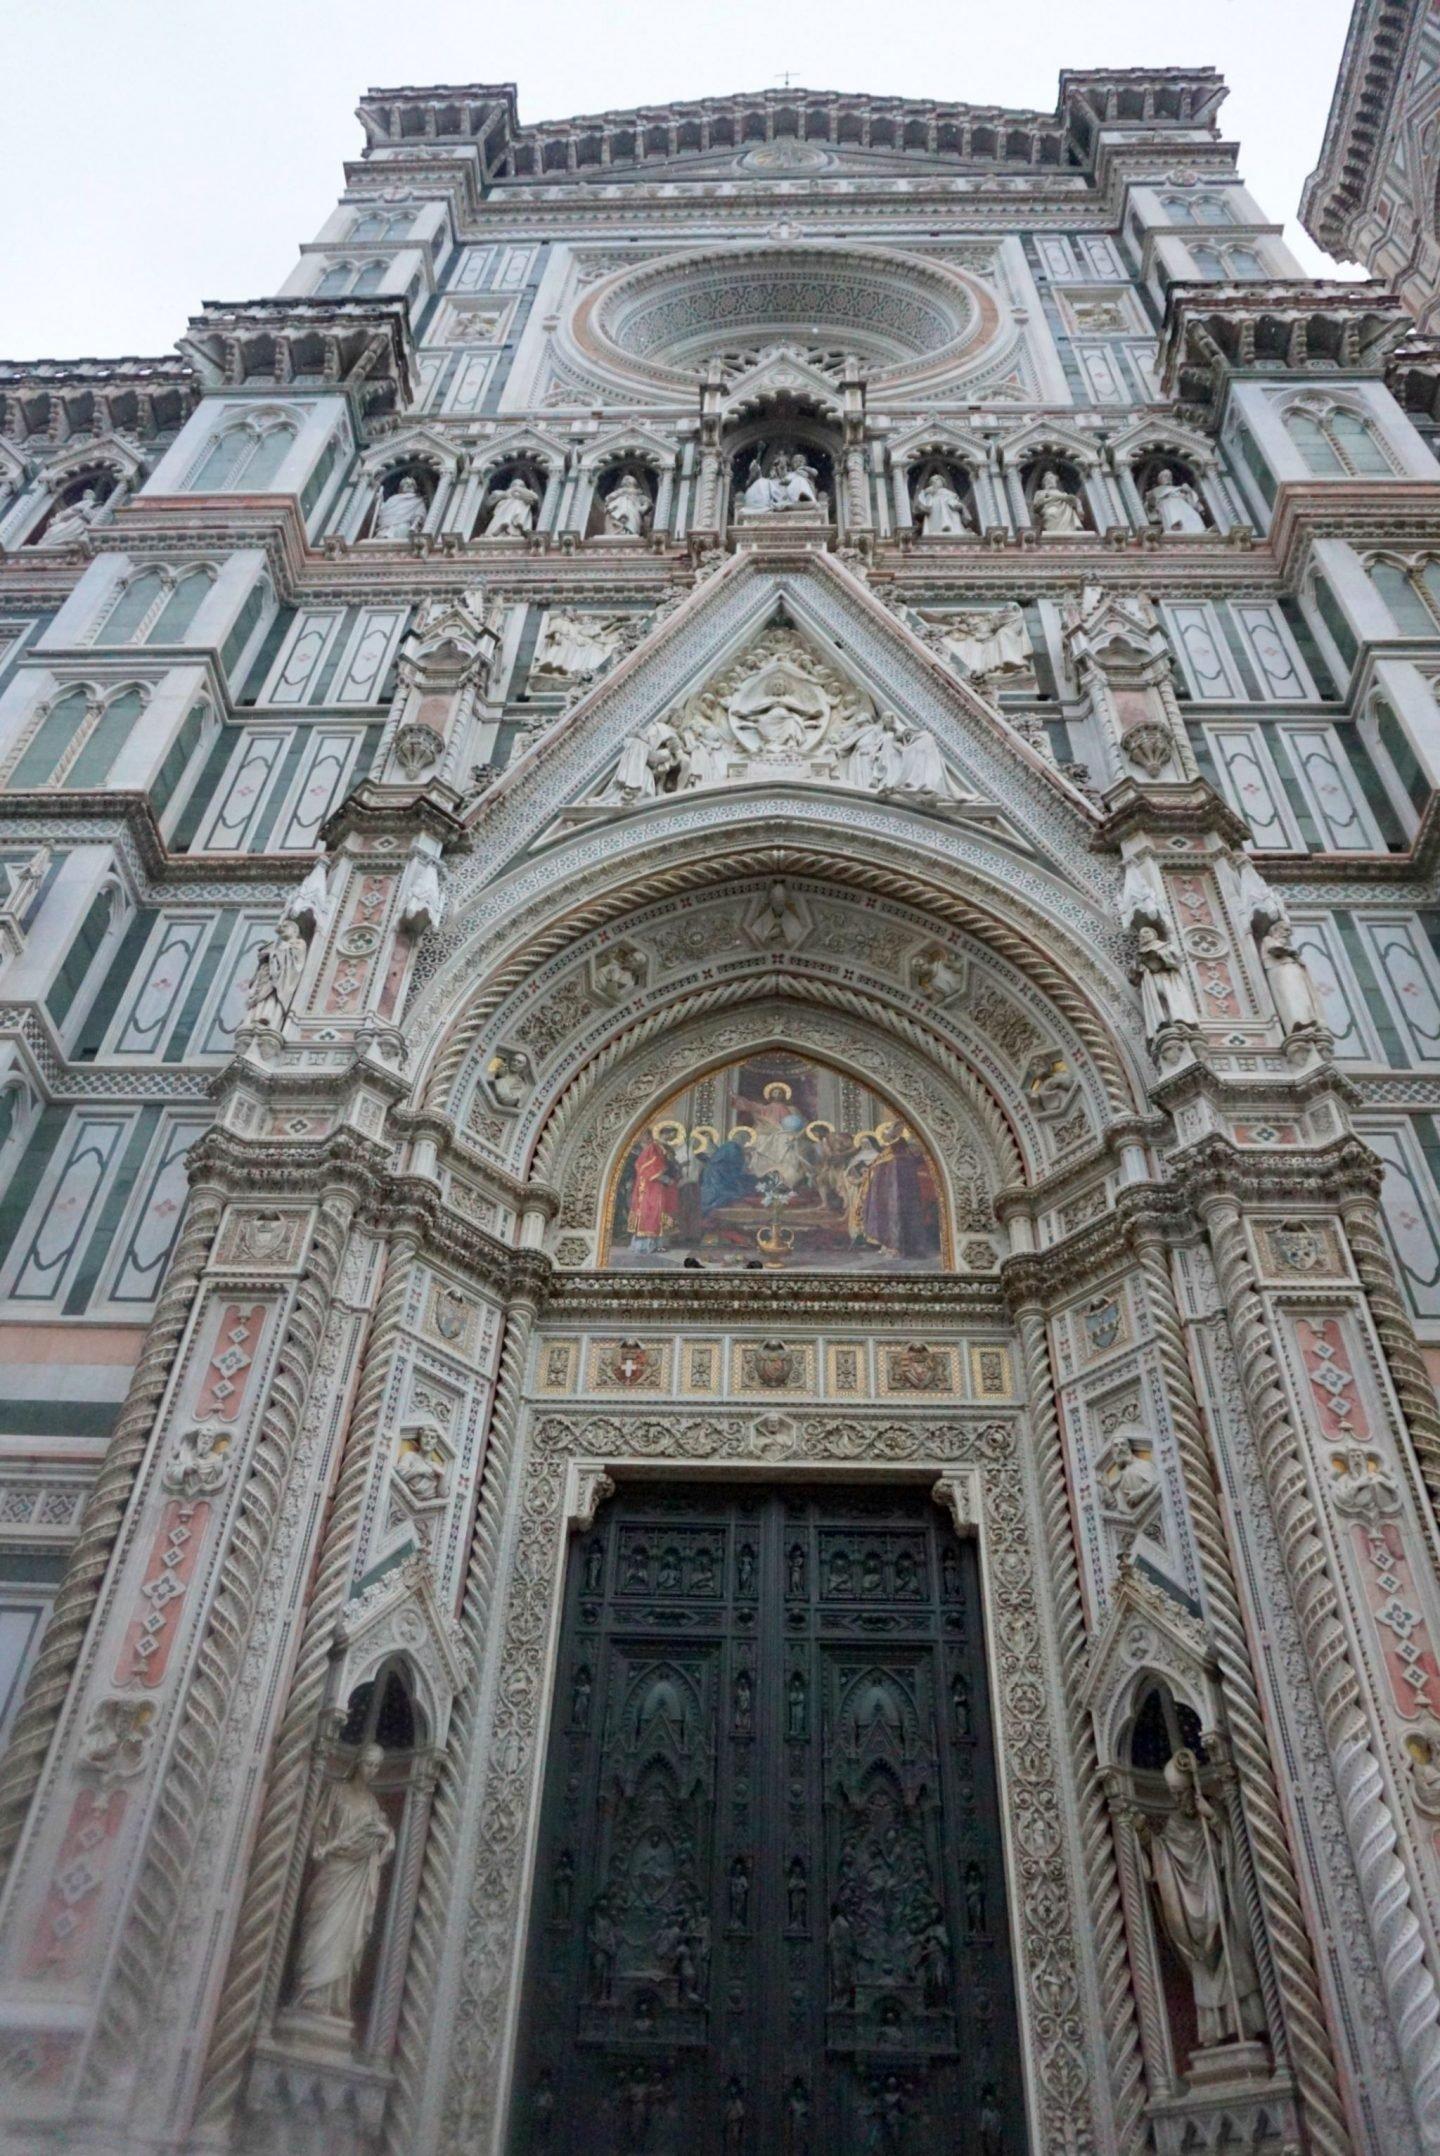 Visiting the Duomo Florence www.extraordianrychoas.com